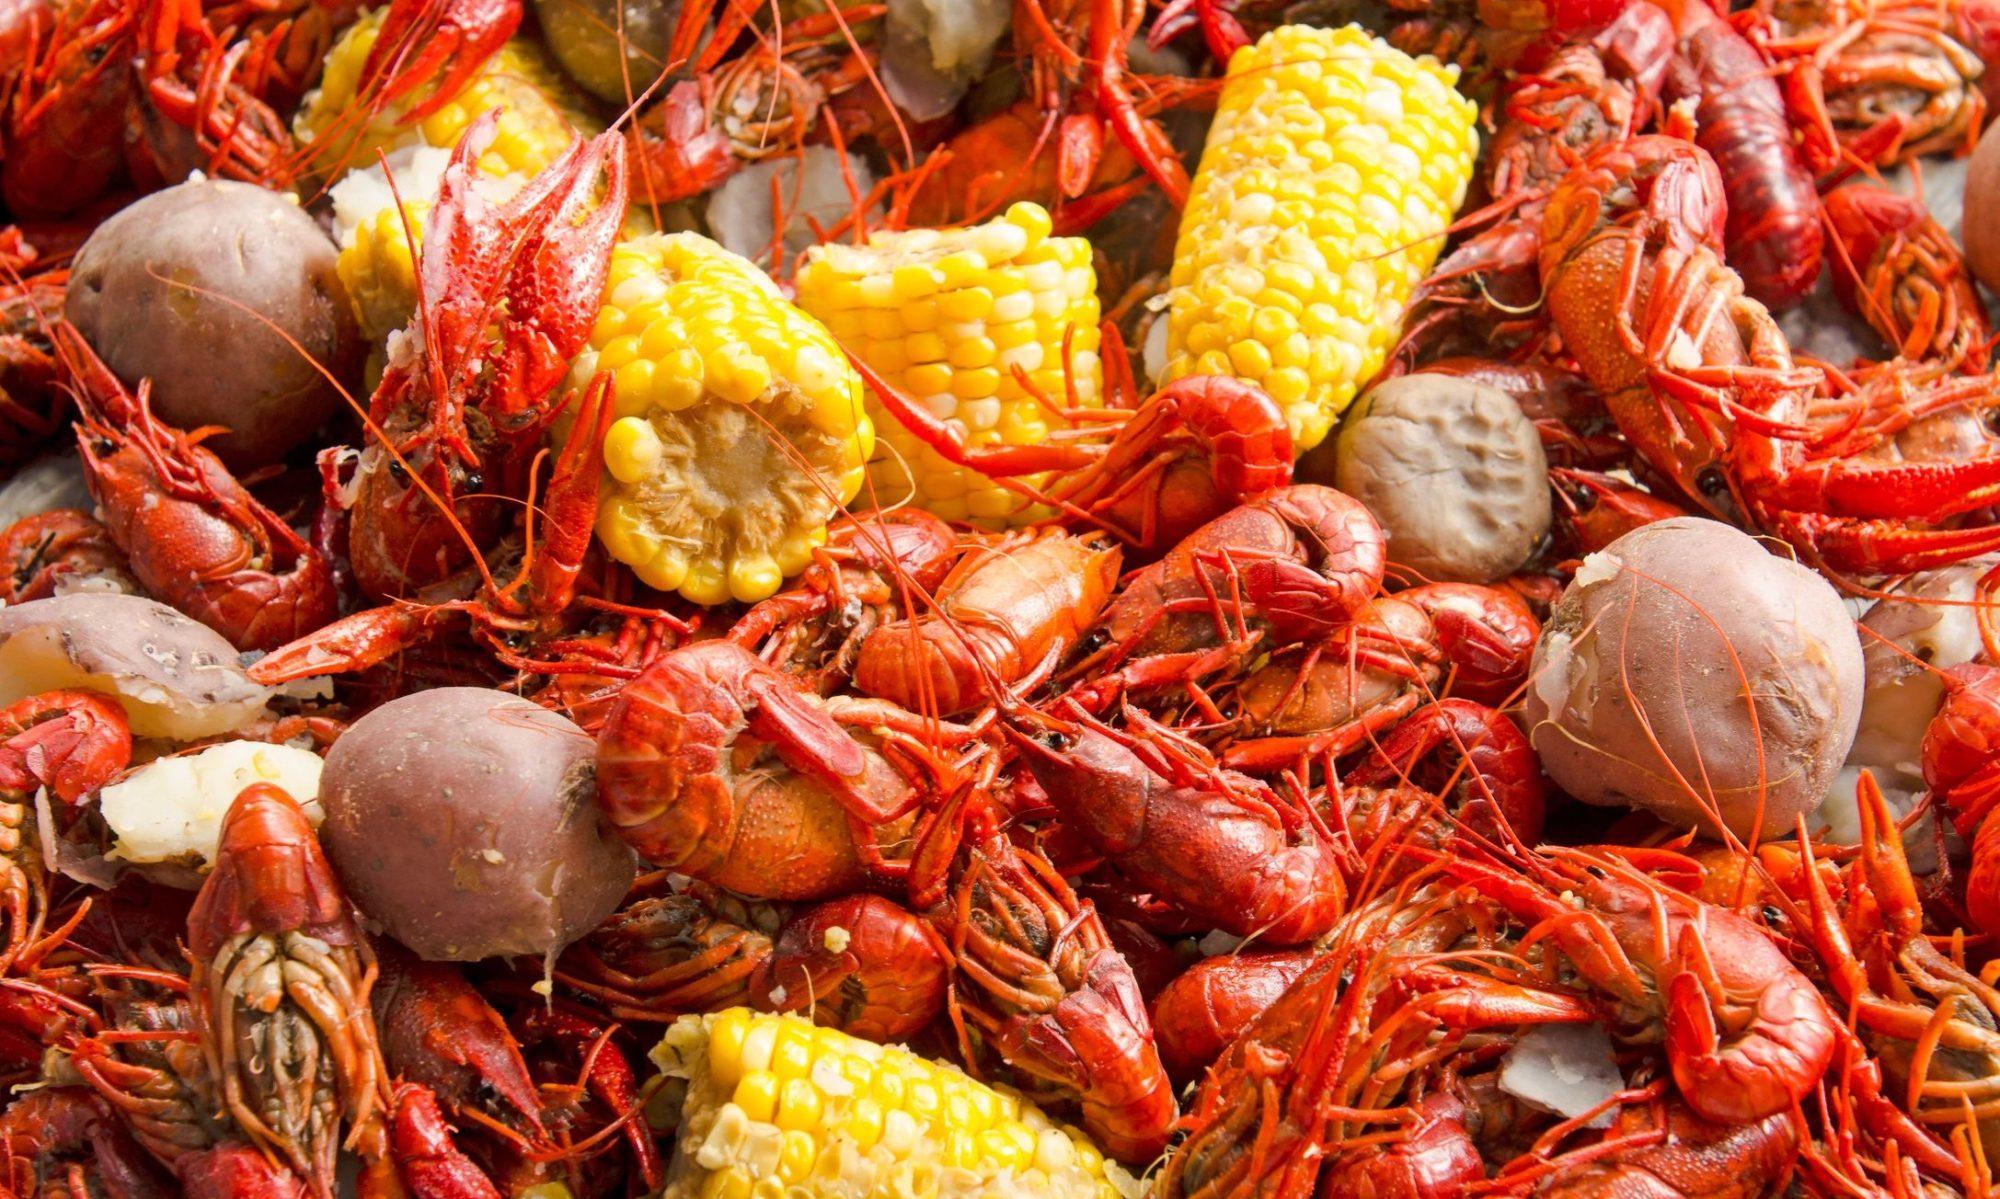 Tallahassee Cajun Food - Seafood - Oyster Bar, Seafood Restaurant